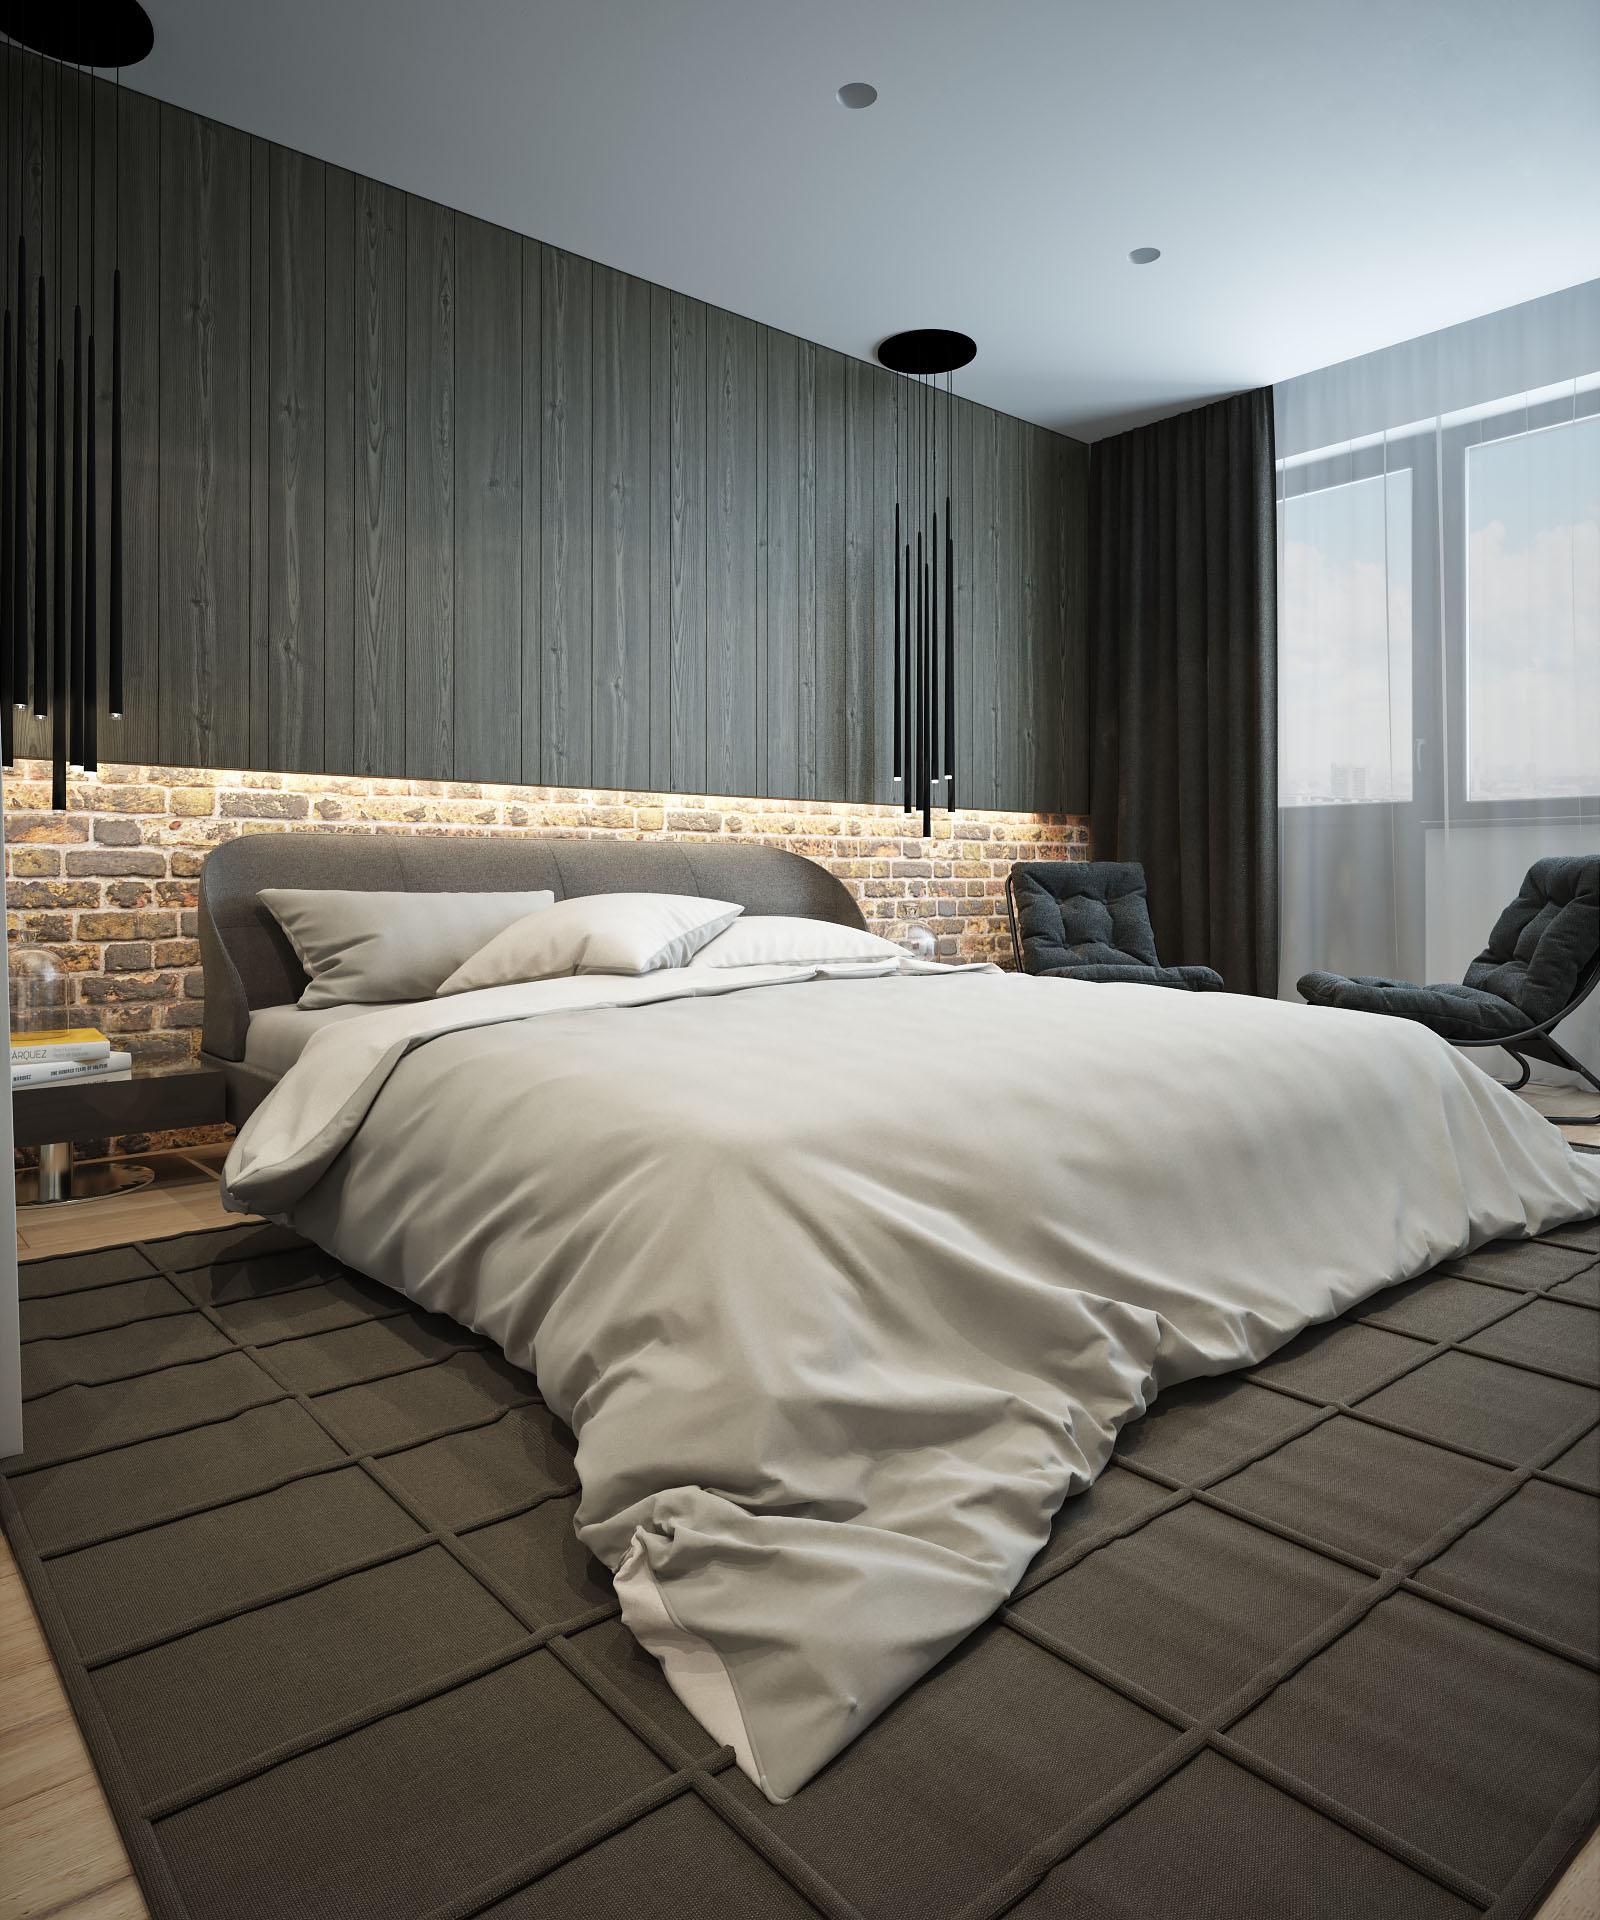 high ceiling bedroom ideas - high ceiling bedroom